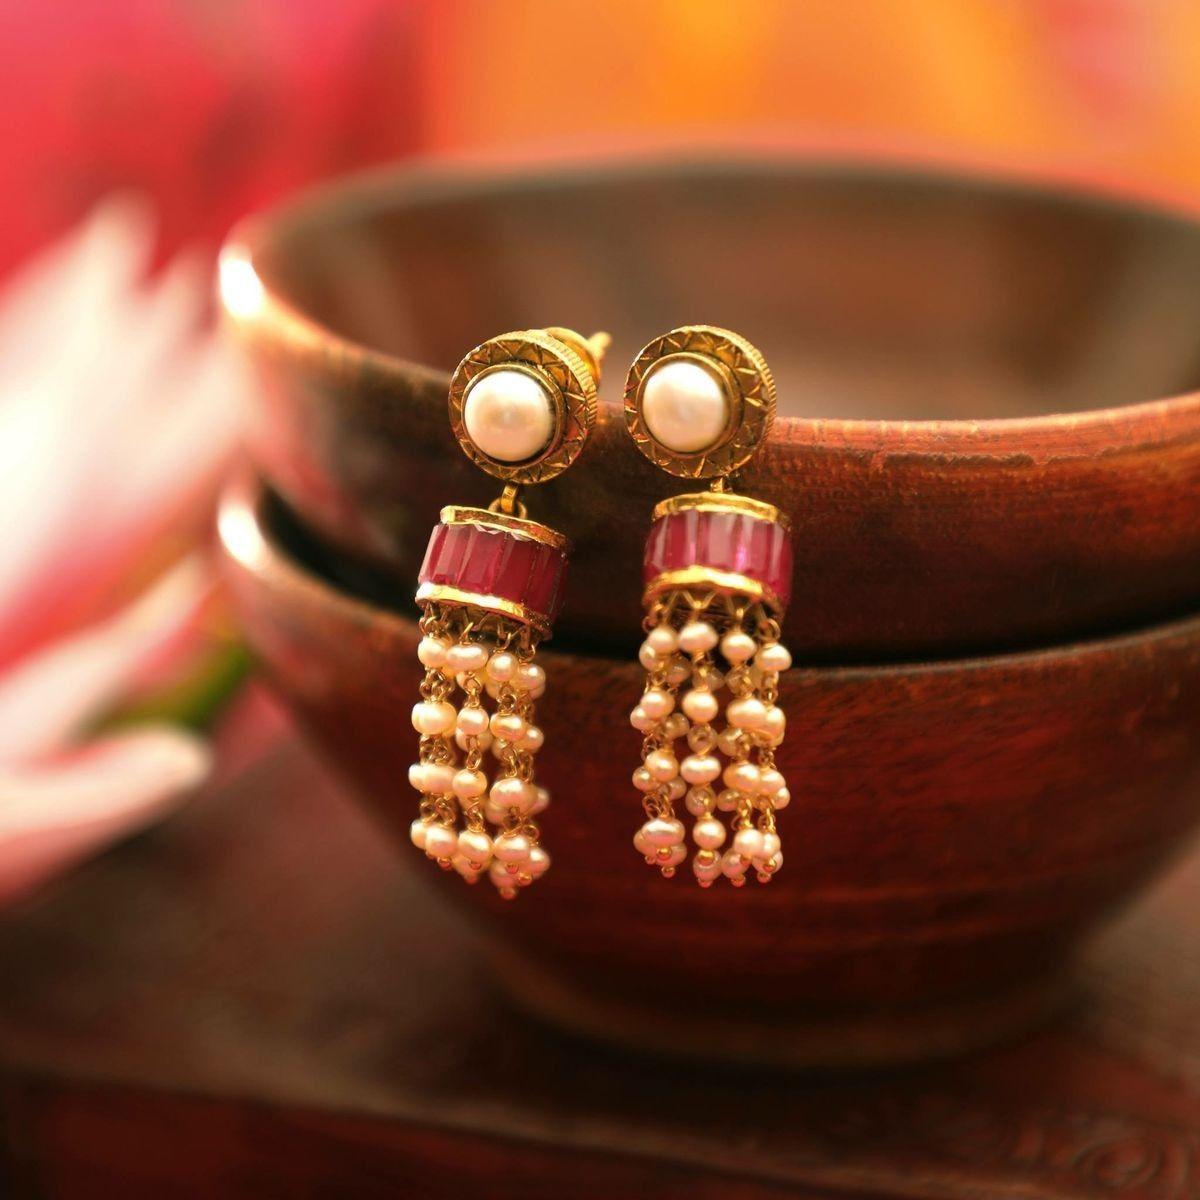 Pin by Valli Amalan on Beads Pinterest Jewel Beautiful earrings